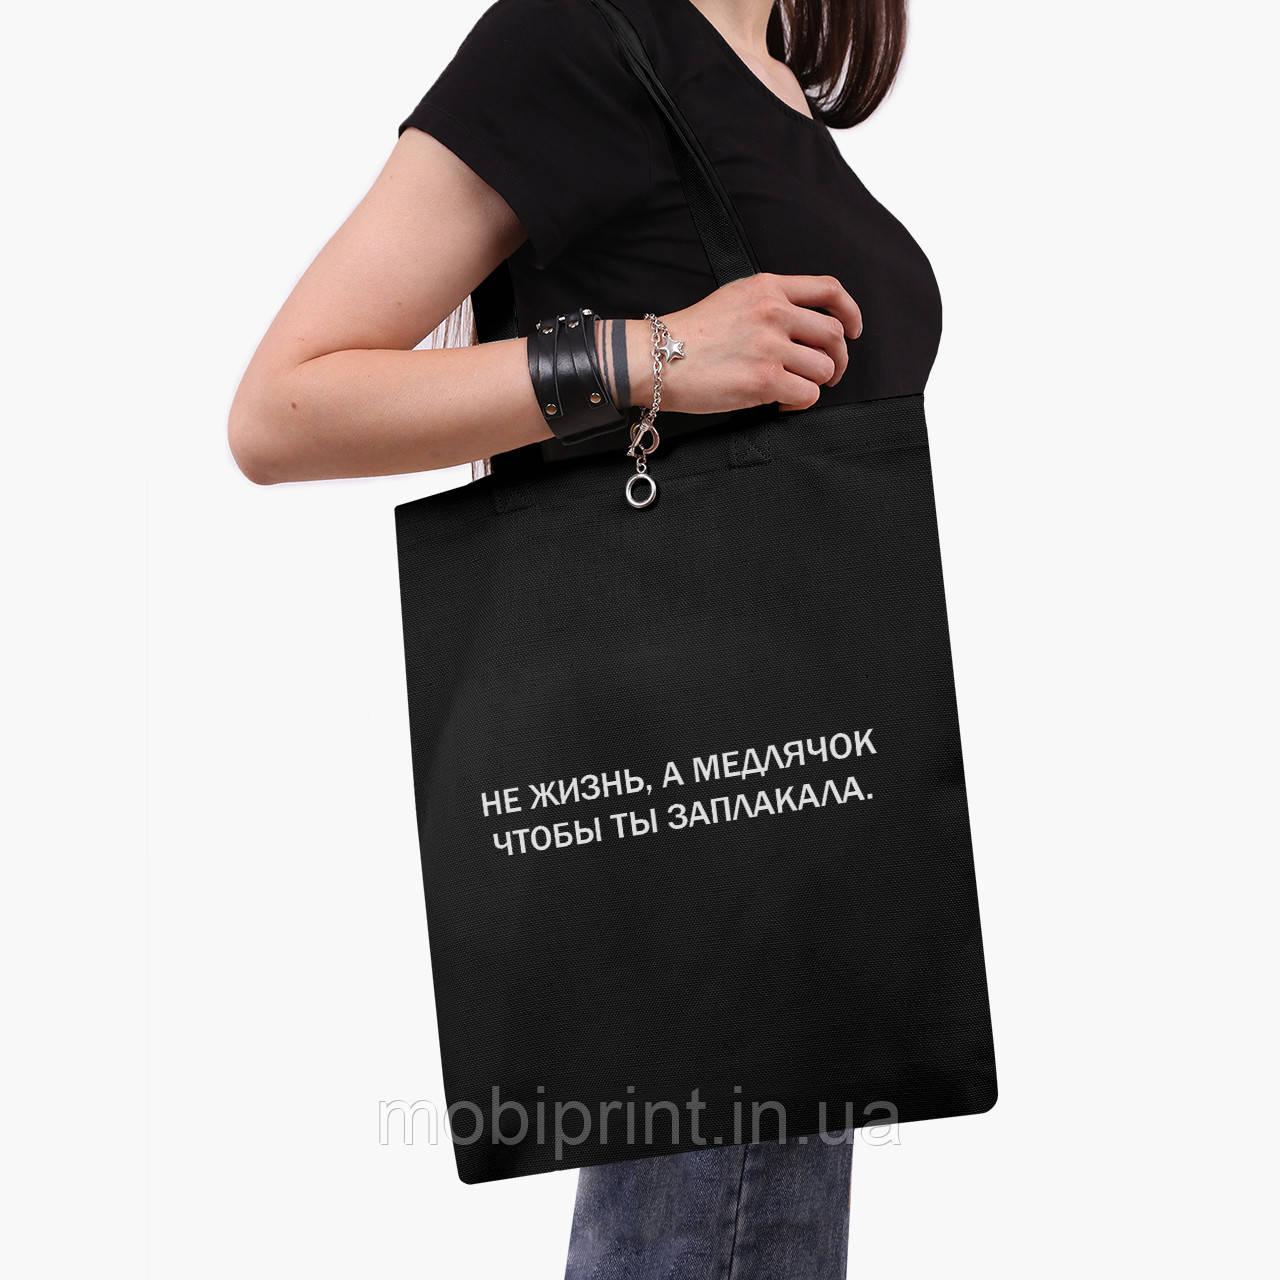 Еко сумка шоппер чорна Медлячок (Slow dance) (9227-1785-2) экосумка шопер 41*35 см